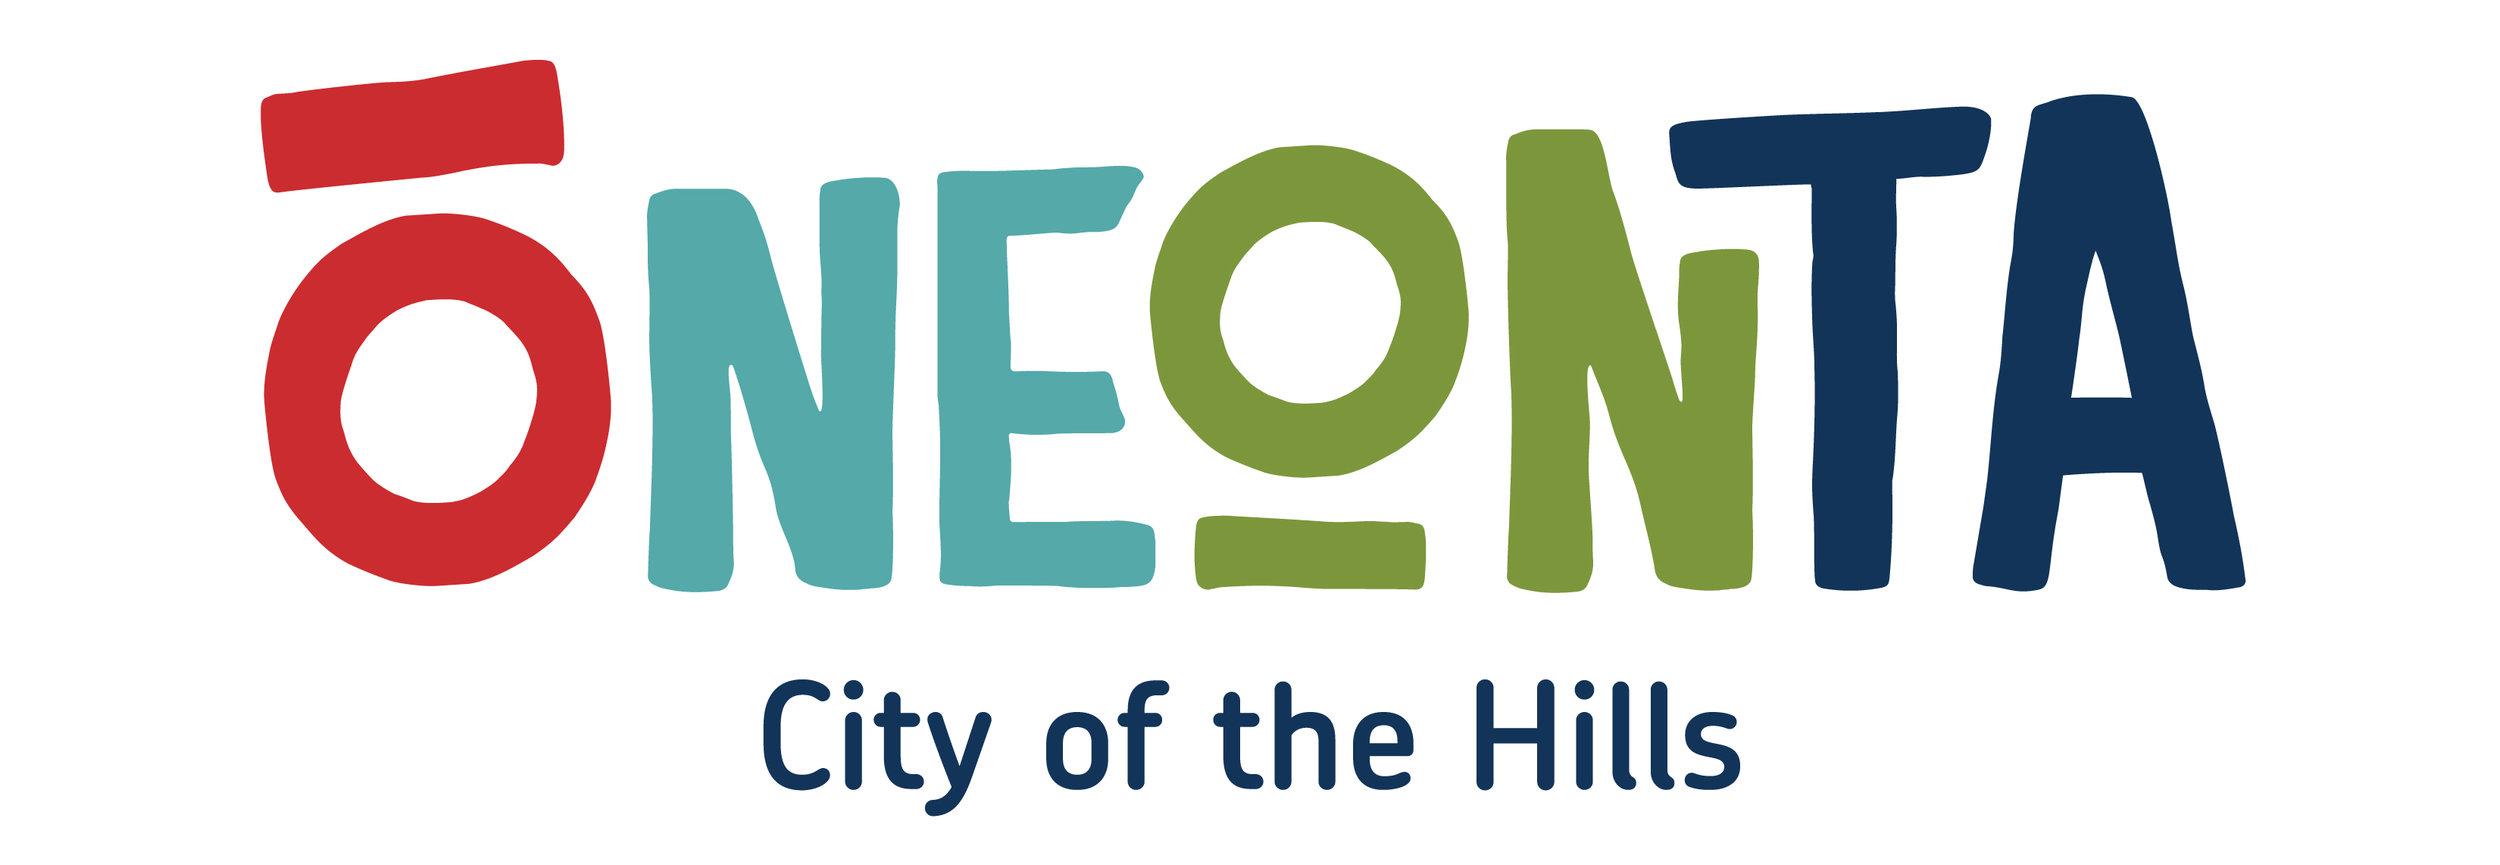 20190716_Oneonta-Logo_City of the Hills_RGB.jpg